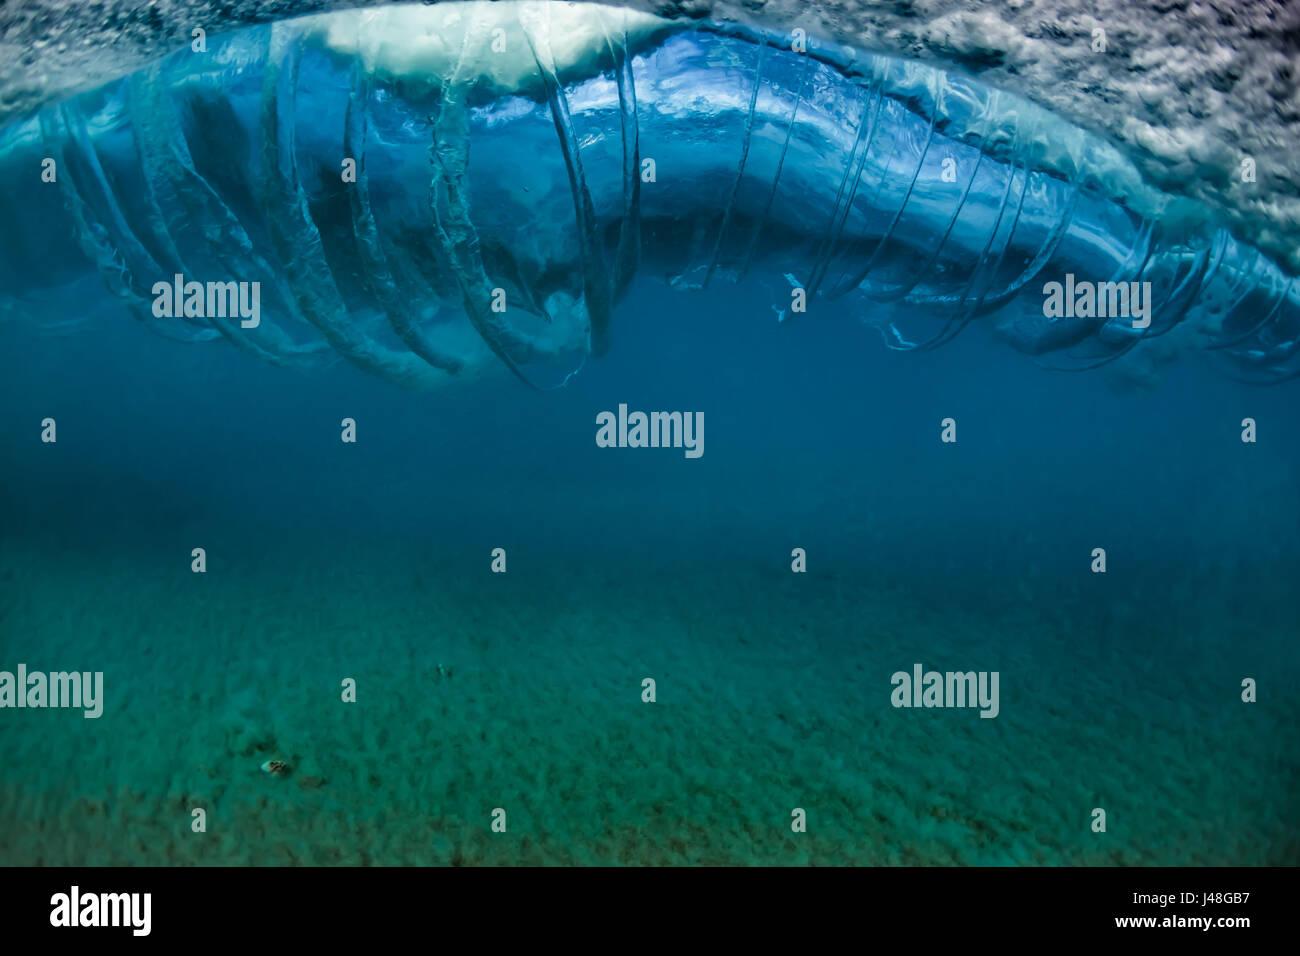 Breaking A Mirror Stockfotos & Breaking A Mirror Bilder - Alamy